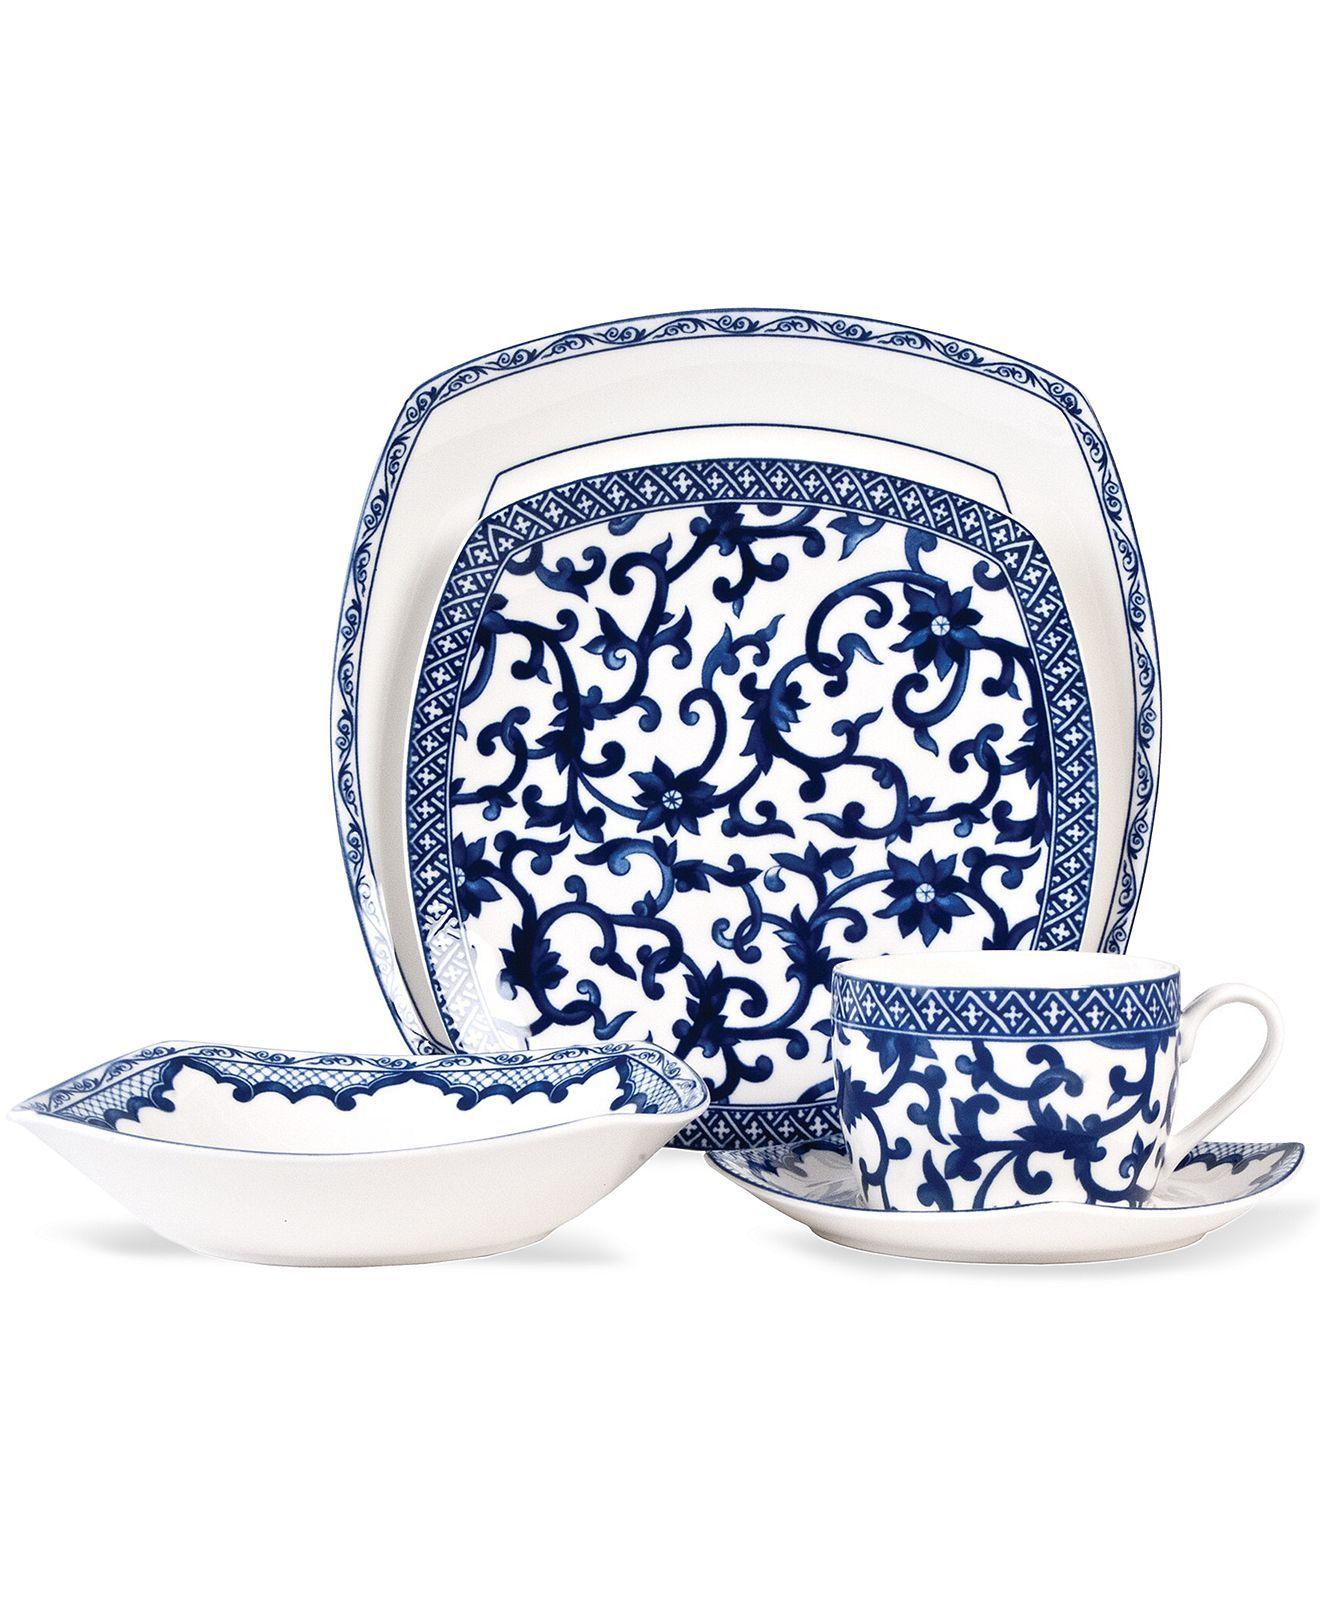 Lauren Ralph Lauren Dinnerware, Mandarin Blue Square